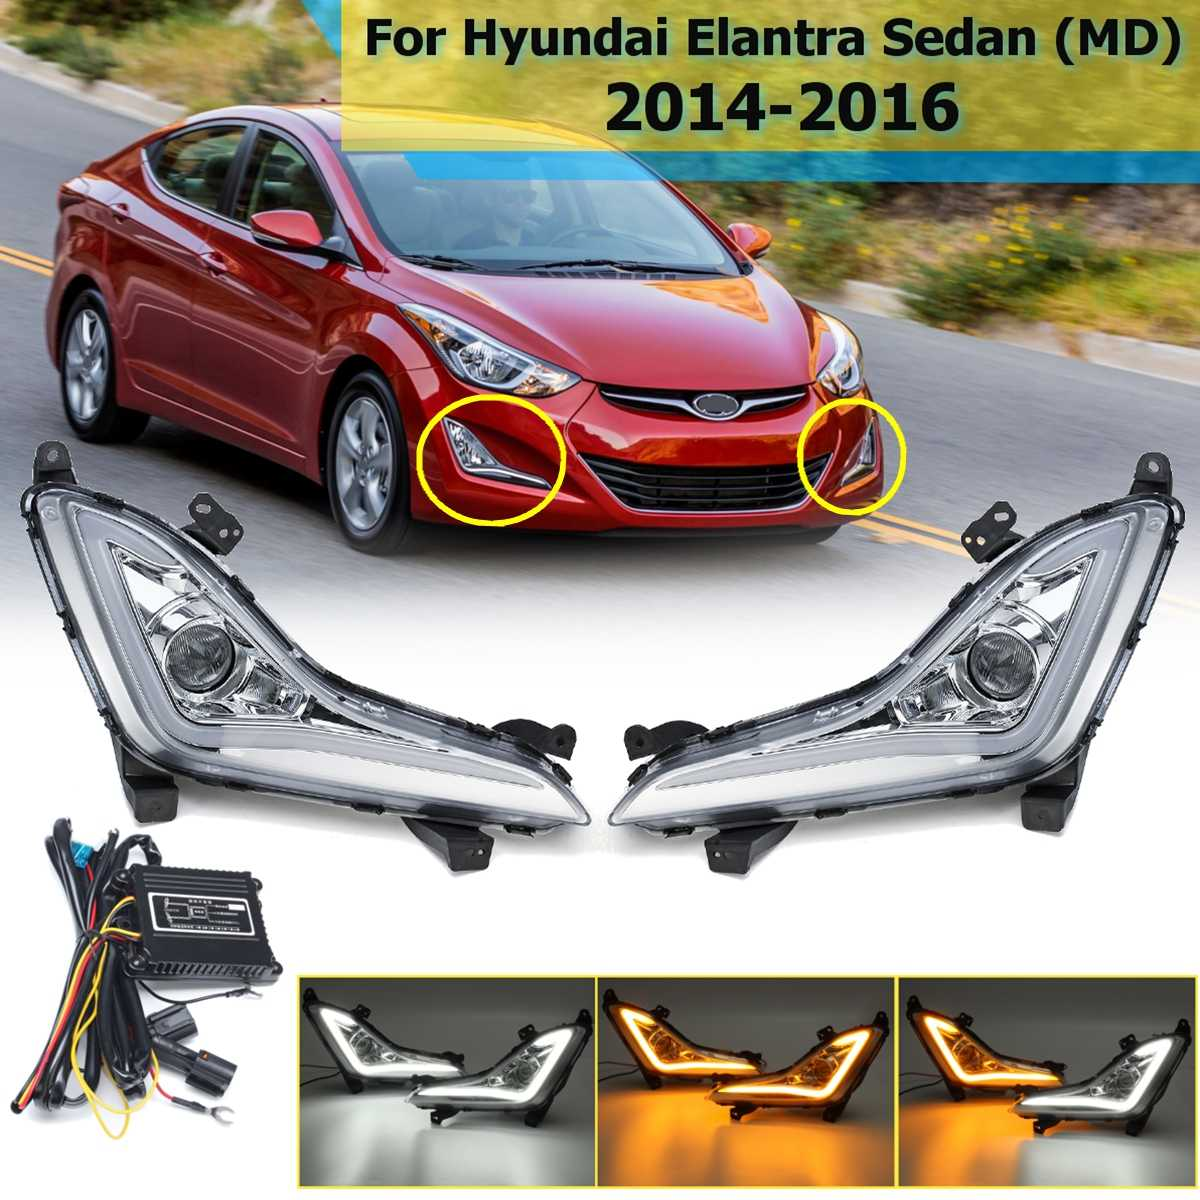 1 Pair Front Led DRL For Hyundai Elantra Sedan 2014 2015 2016 Daytime Running Light Fog Lamp DIY Turn Signal Car Styling